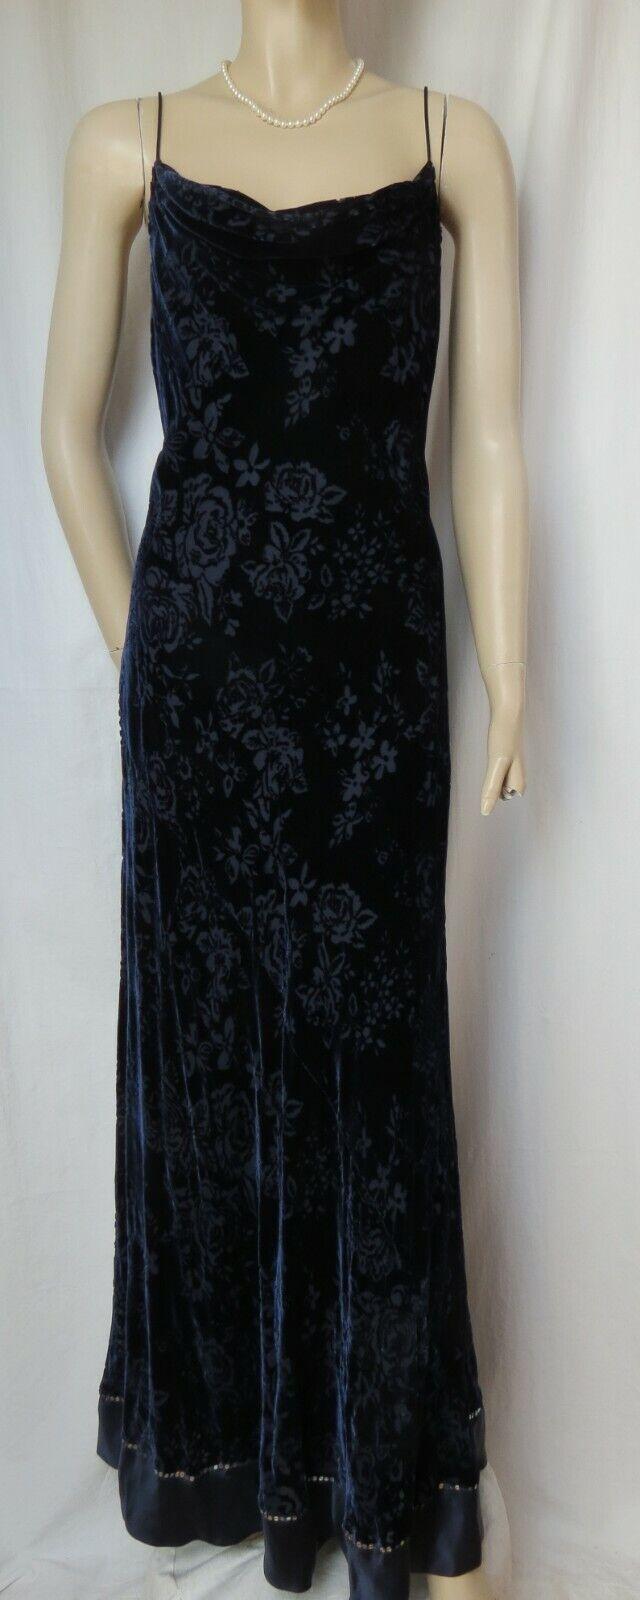 b5f540b20146f6 Abendkleid 42 Samt dunkelblau Hochzeit lang Ballkleid Monsoon blau Abiball  Seide nutabo2185-neue Kleidung